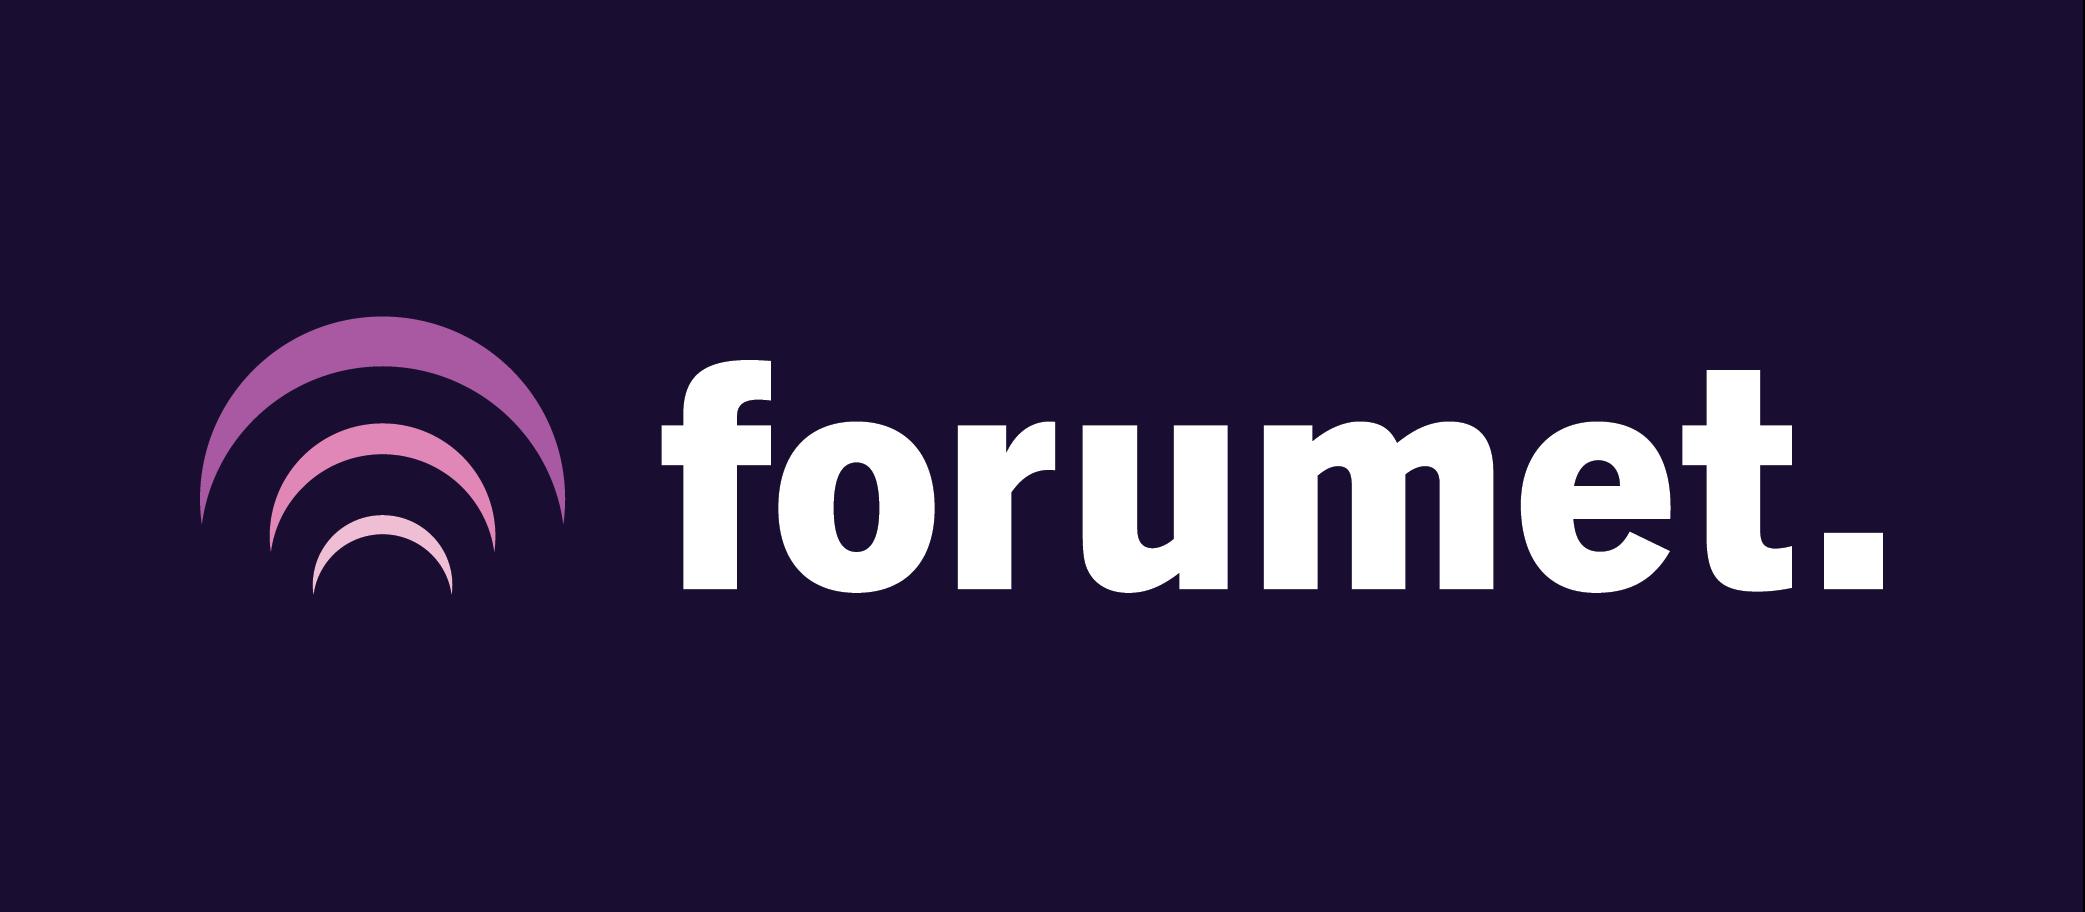 Ny episode av Forumet!